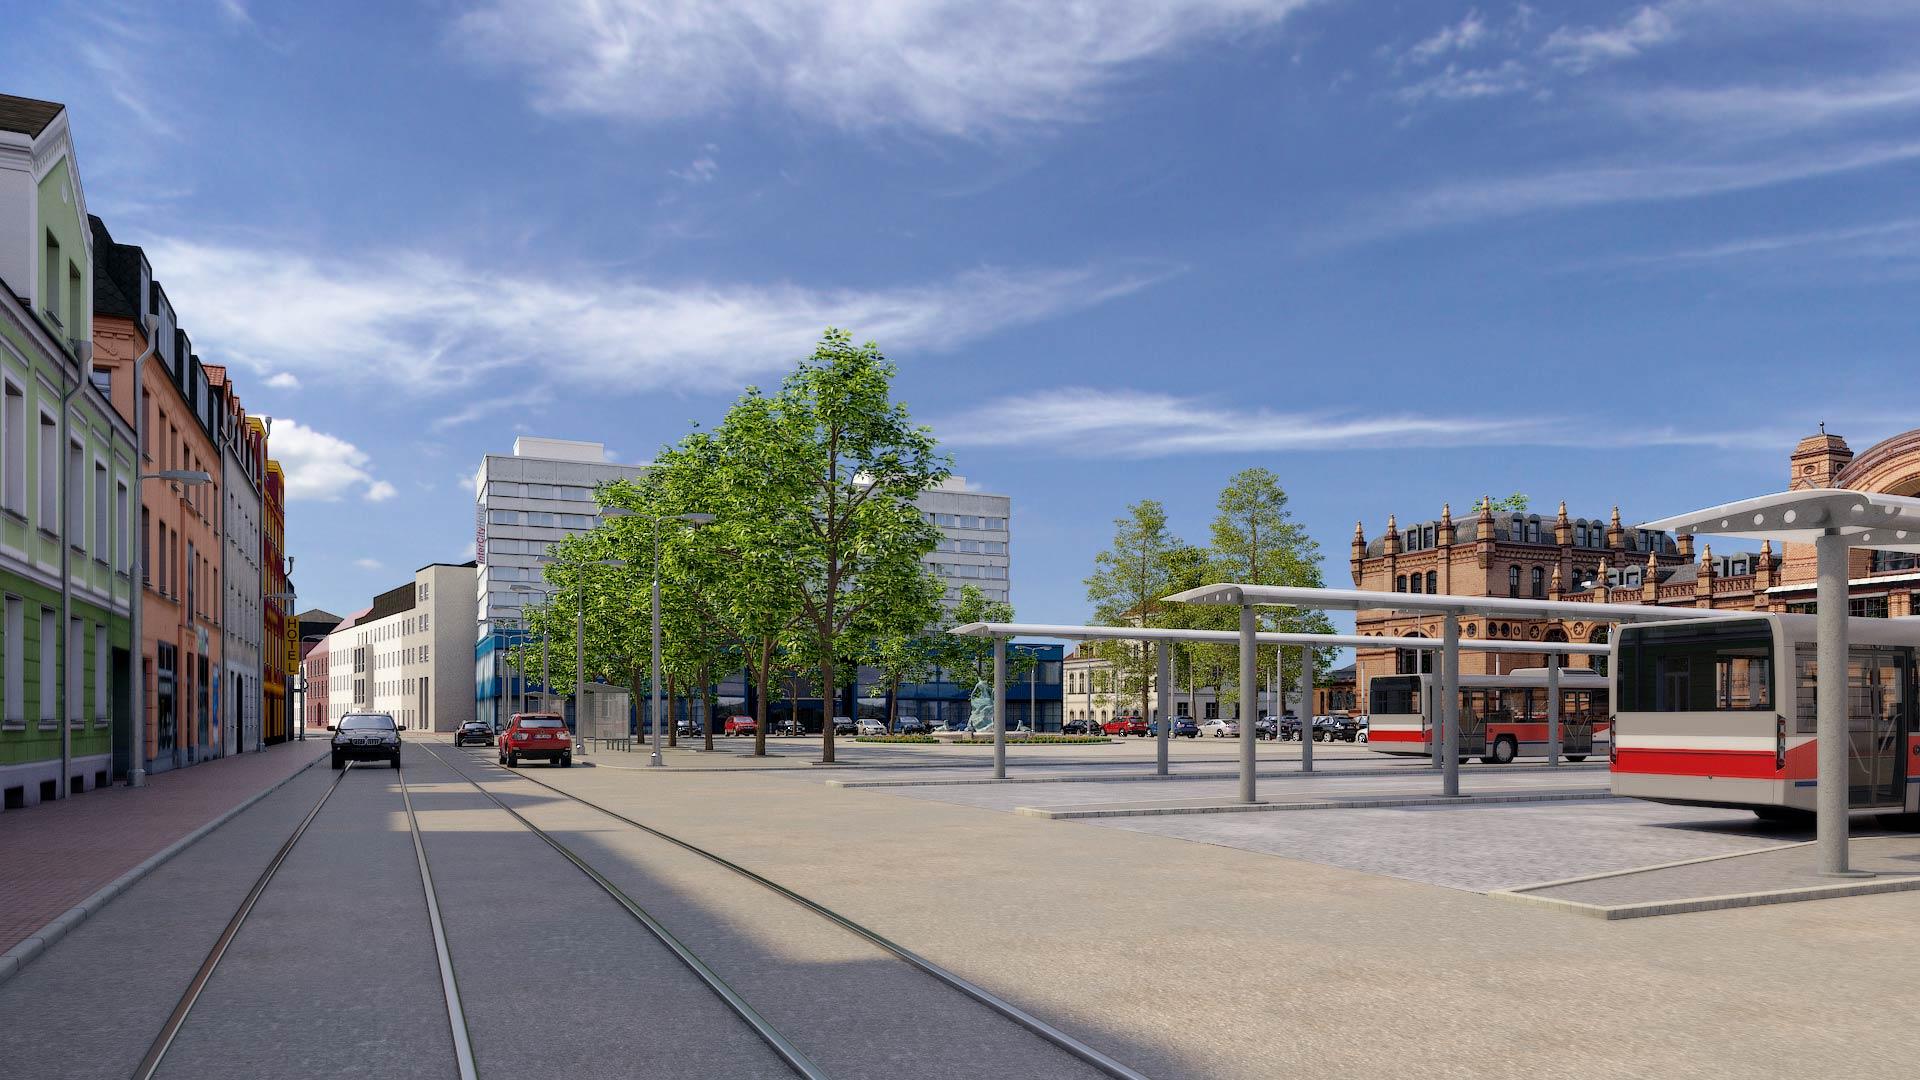 Busbahnhof_Grunthalplatz_Schwerin_3D_Architekturvisualisierung Schwerin Grunthalplatz 3D Architekturvisualisierung